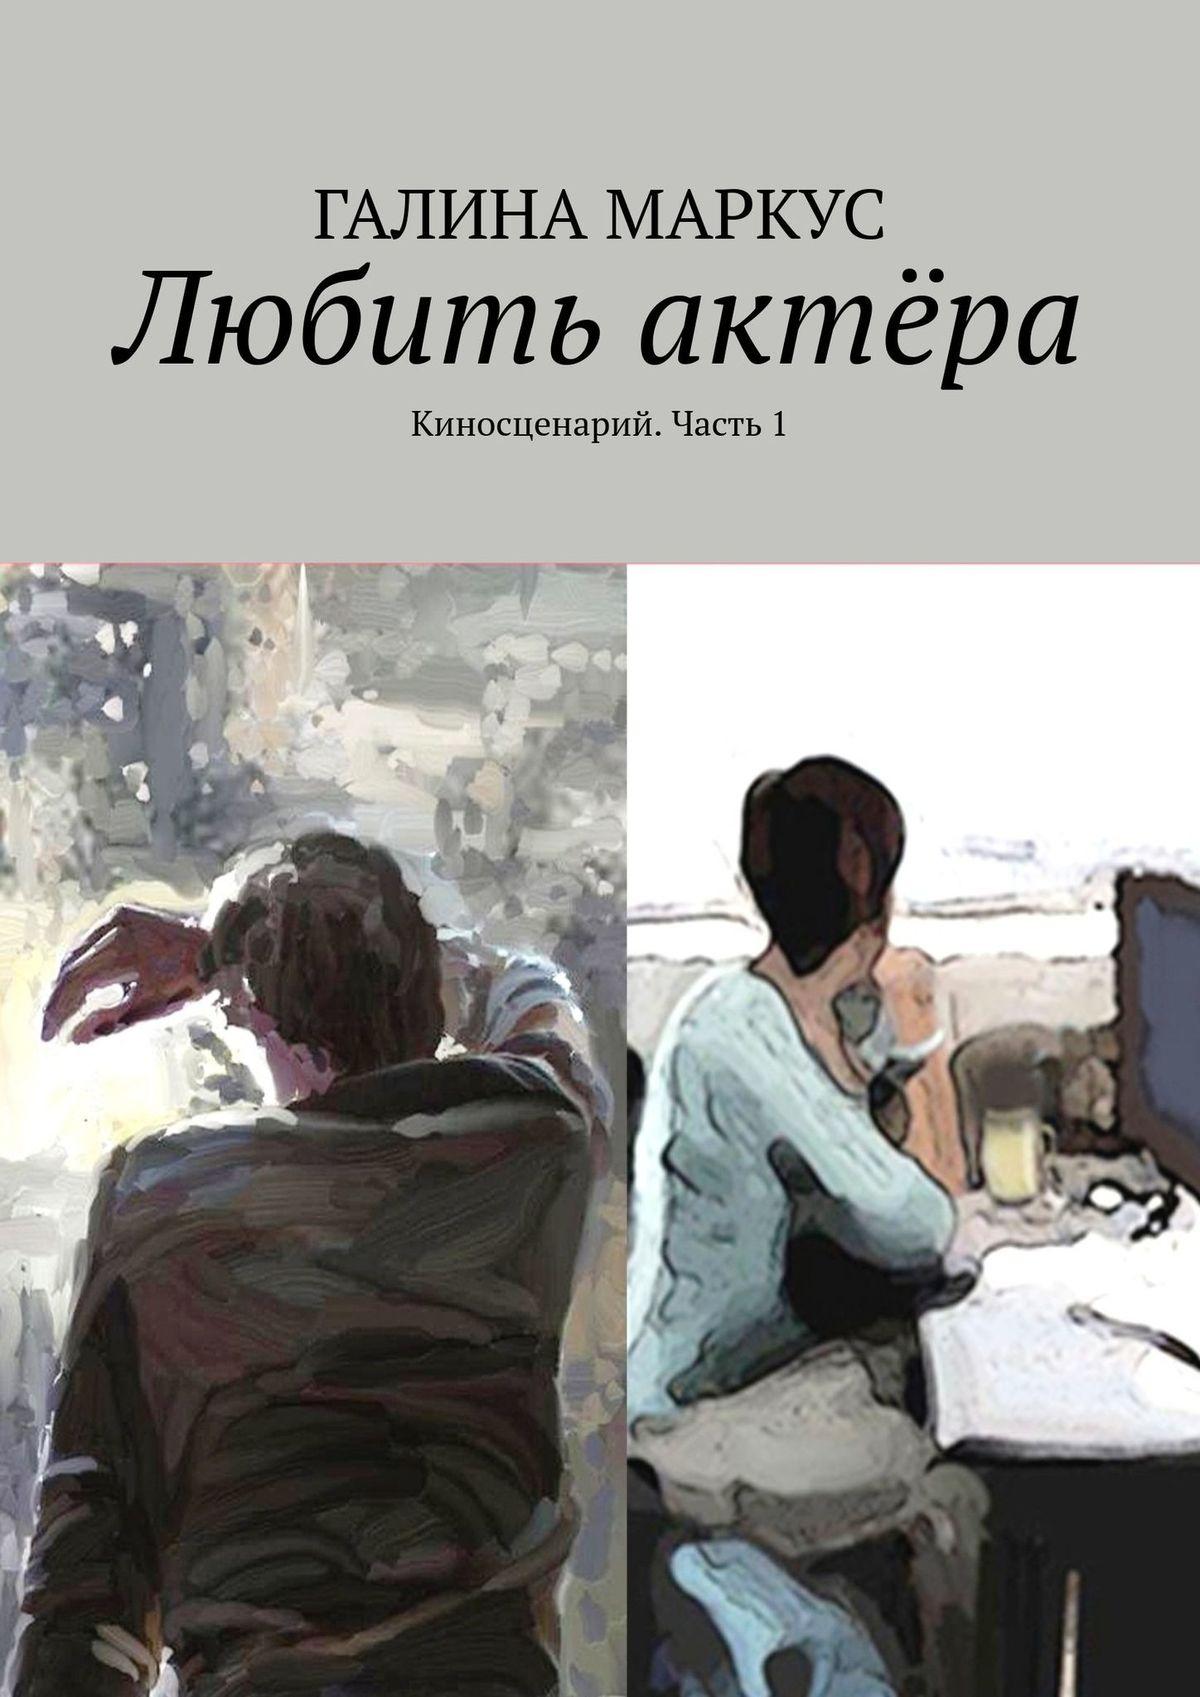 Галина Маркус Любить актёра. киносценарий, 1часть